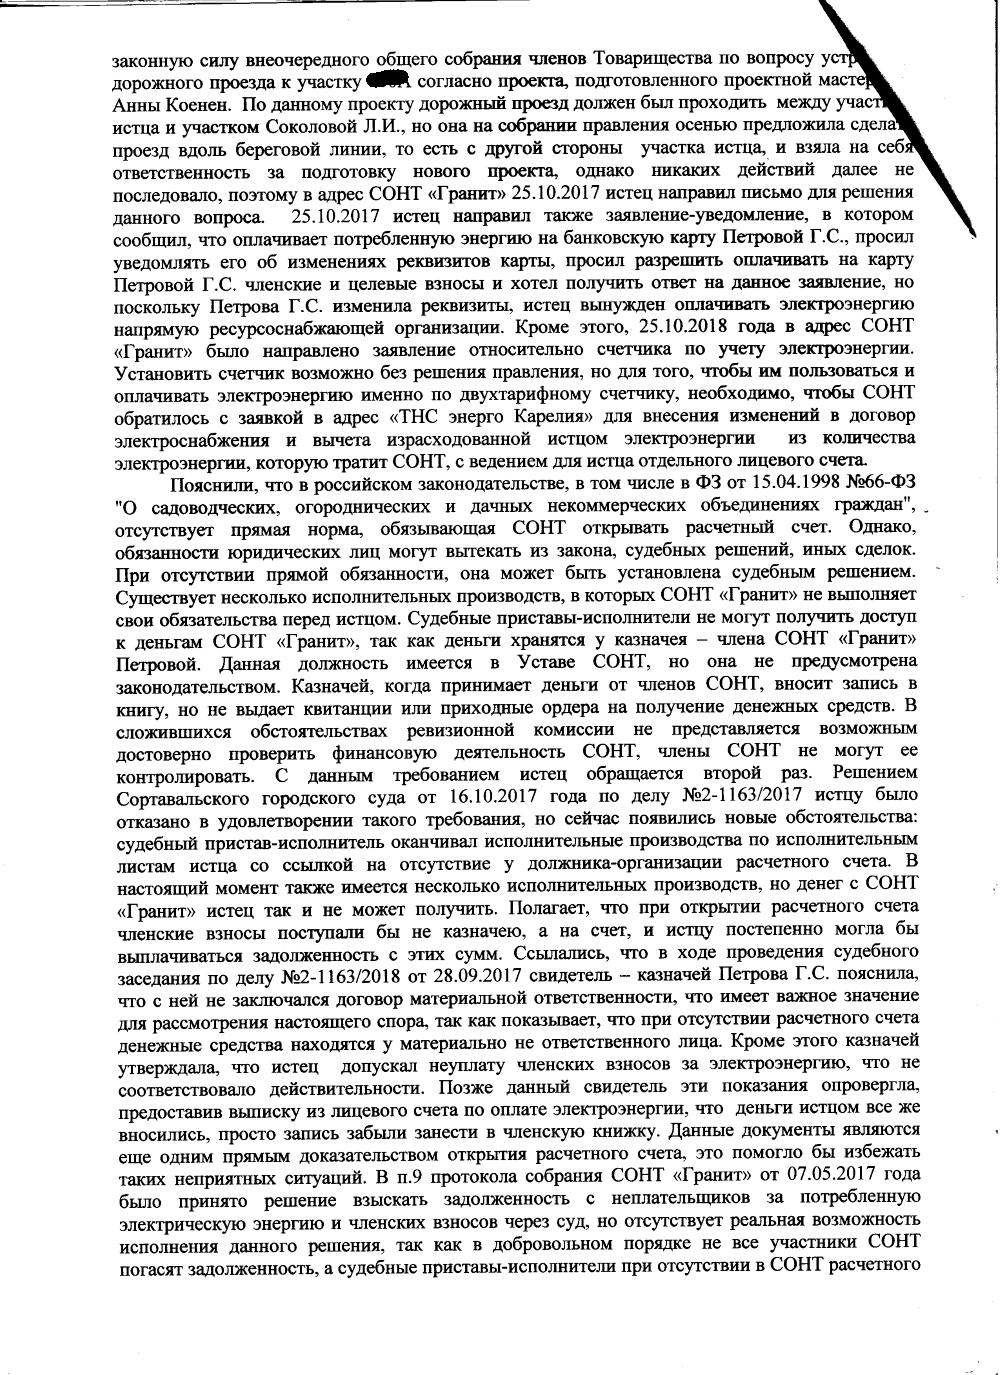 https://sontgranit.ru/forum/img/sokol/20180510-решение-02.png